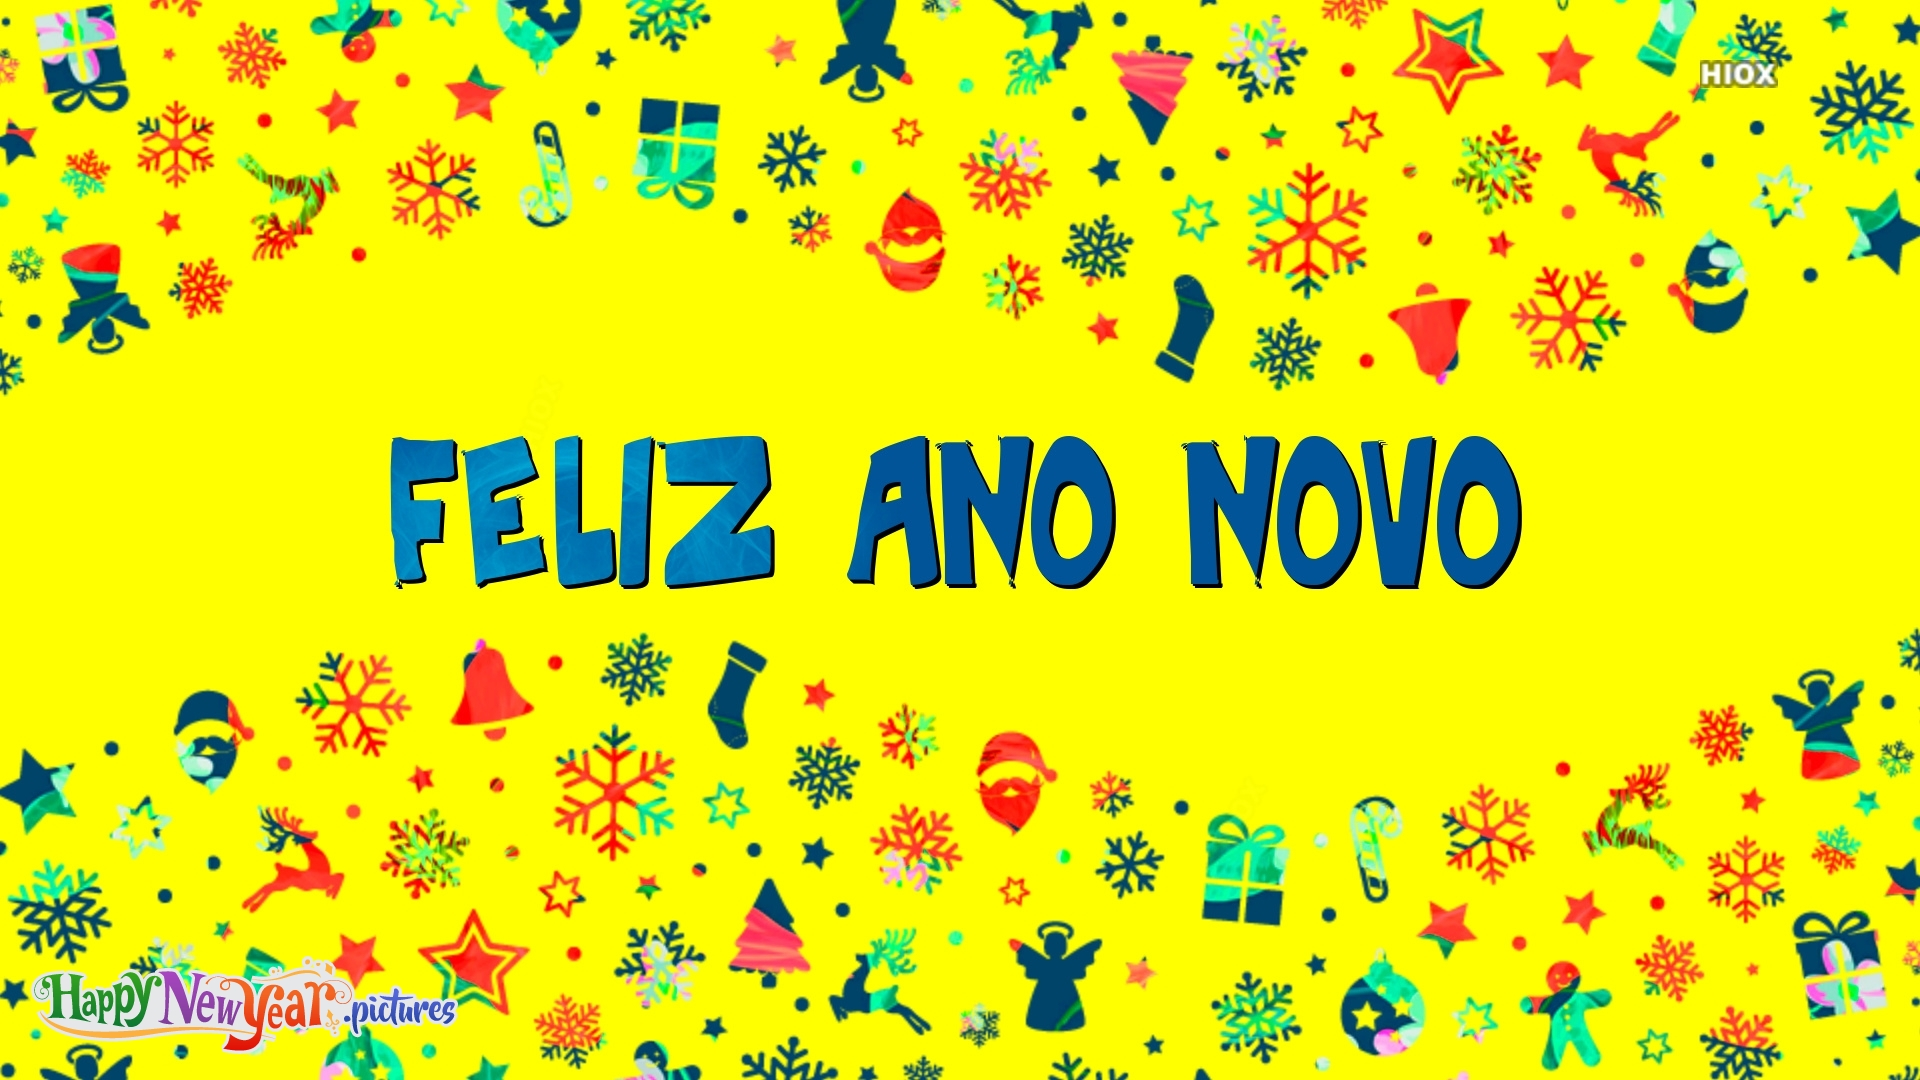 Feliz Ano Novo Amáveis amigos